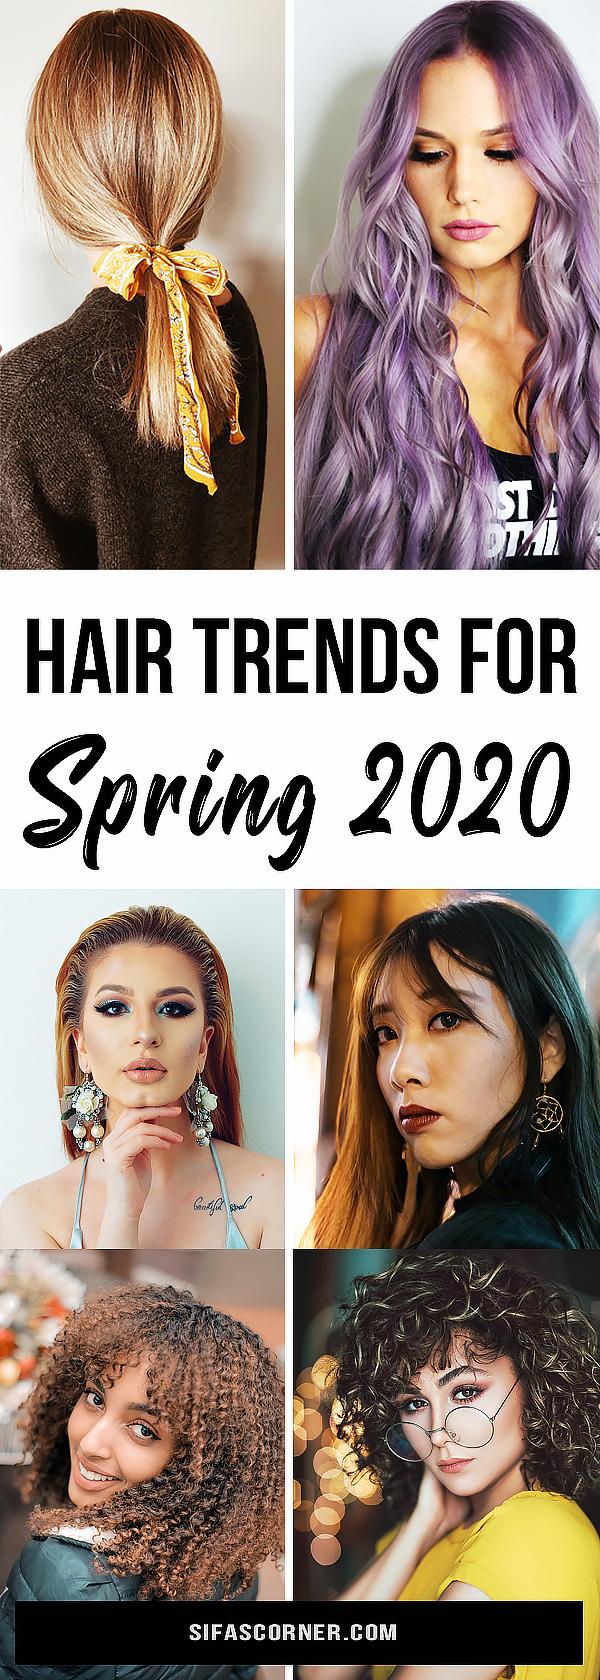 Spring 2020 Hair Trends